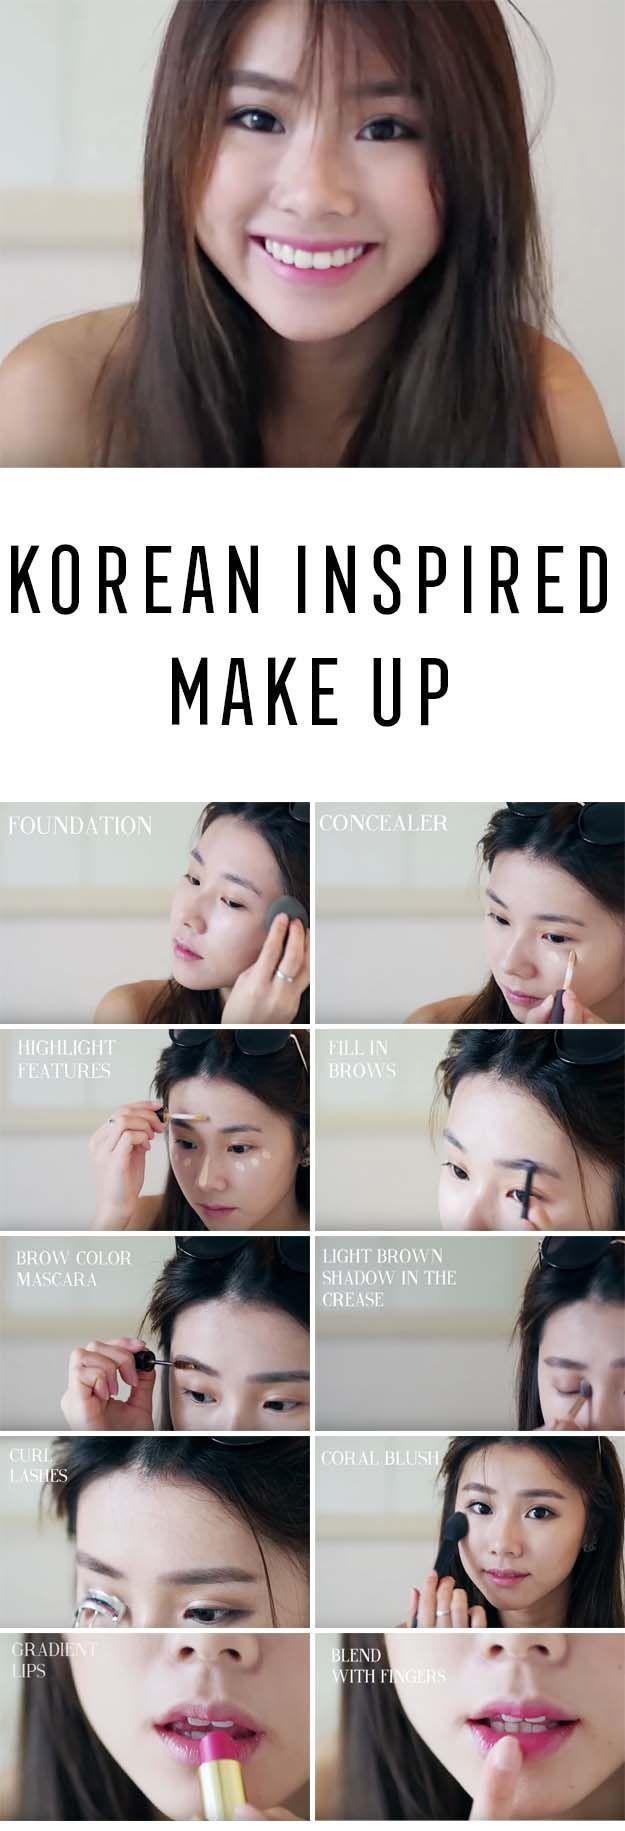 Best Korean Makeup Tutorials - Korean Inspired Make Up Mongabong (Current Make U...